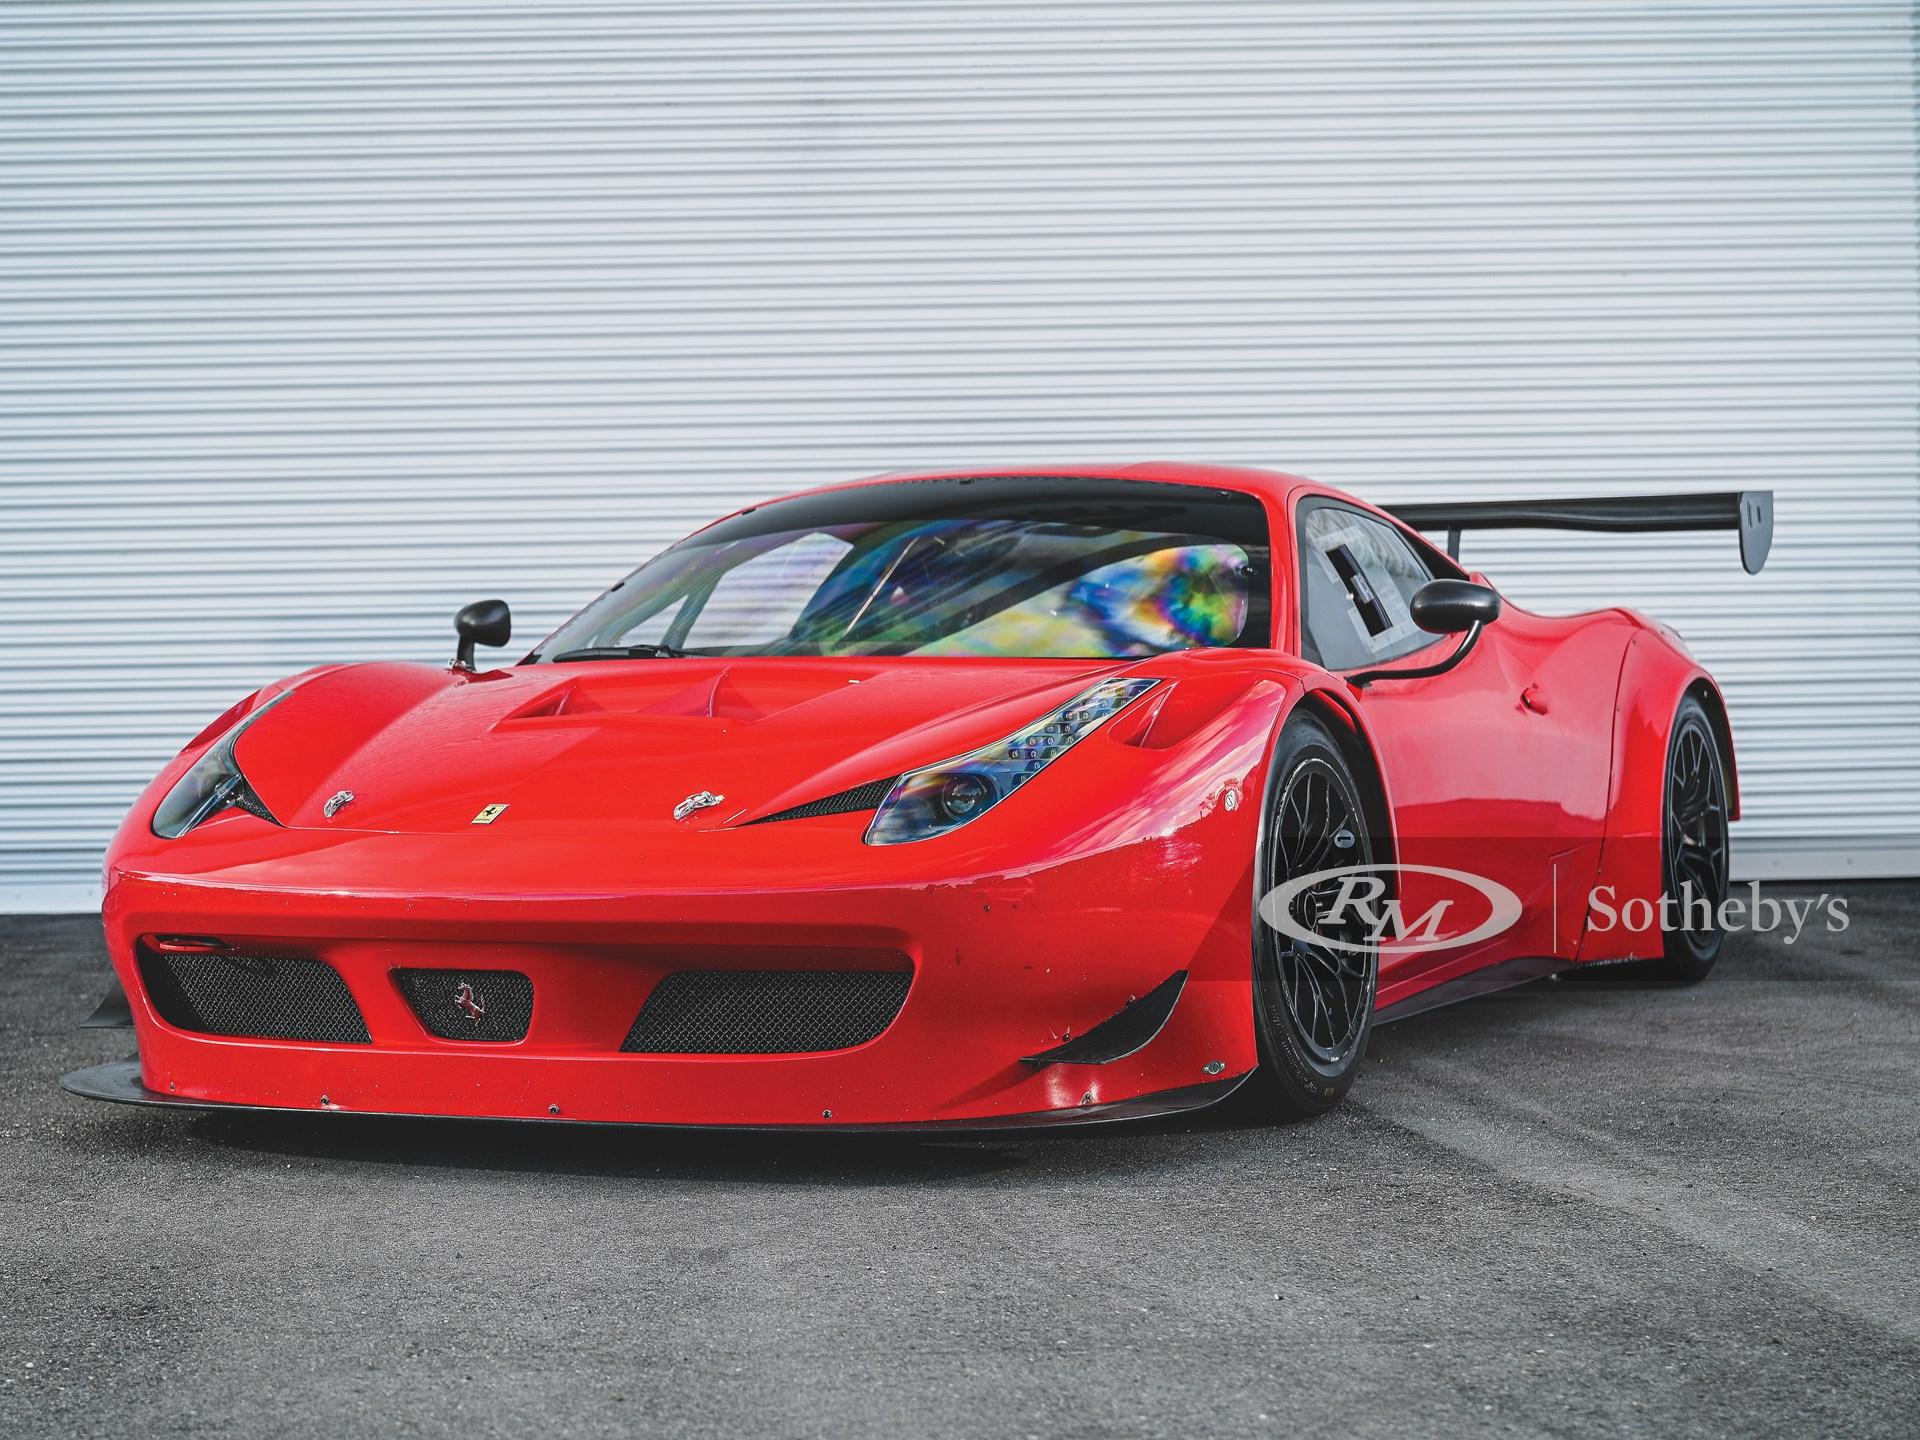 2014 Ferrari 458 Italia Gt3 Arizona 2020 Rm Sotheby S